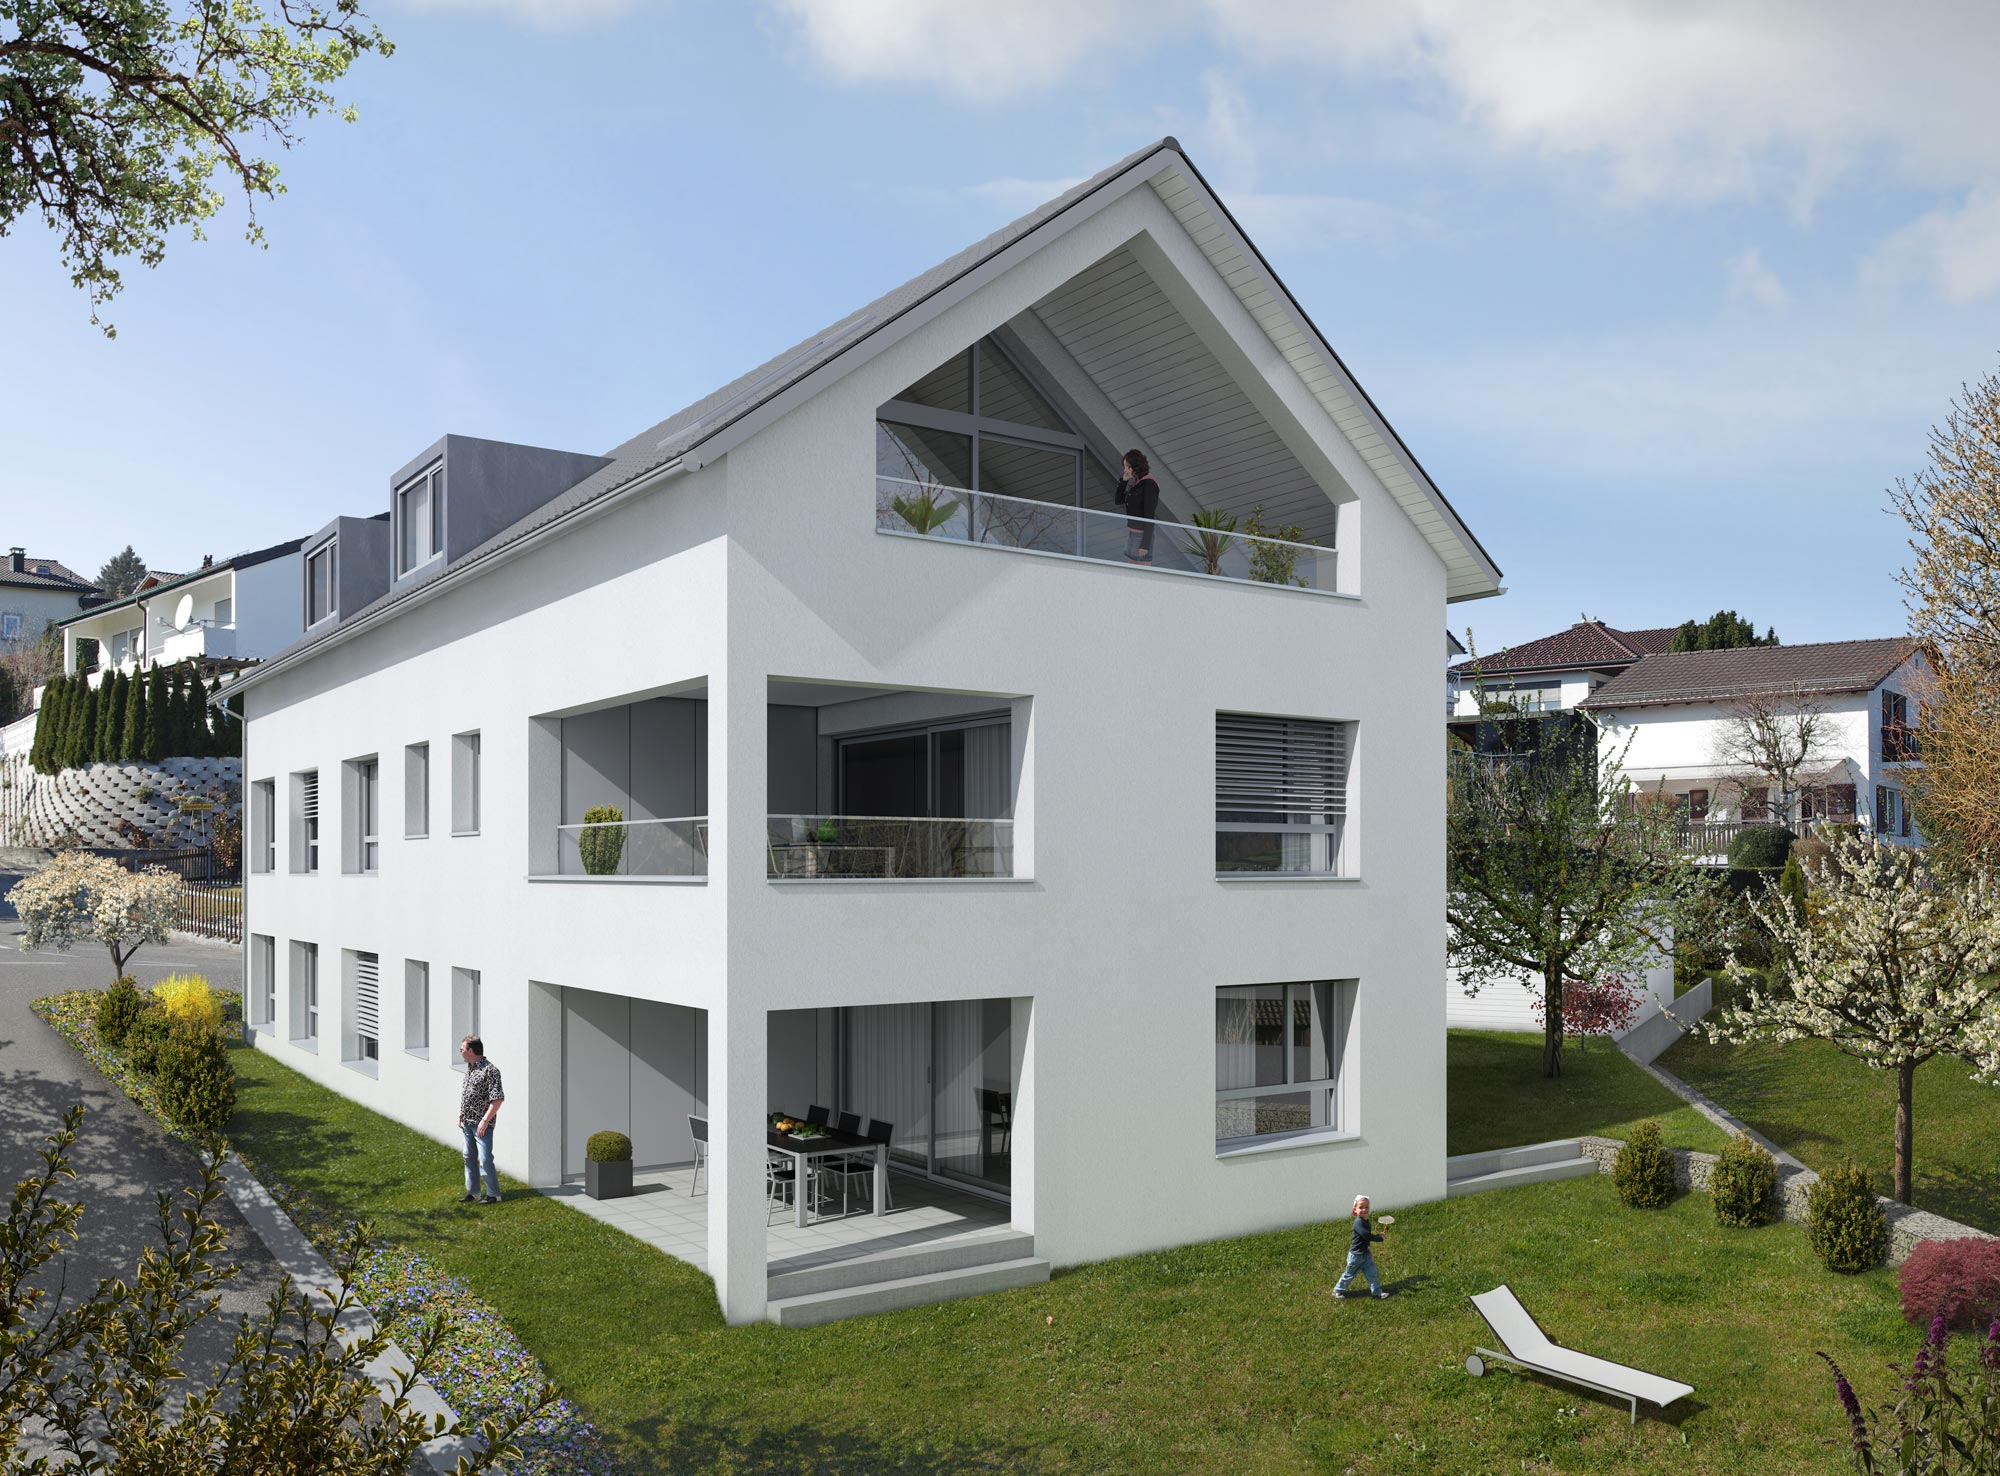 mehrfamilienhaus neubau baustein ag. Black Bedroom Furniture Sets. Home Design Ideas